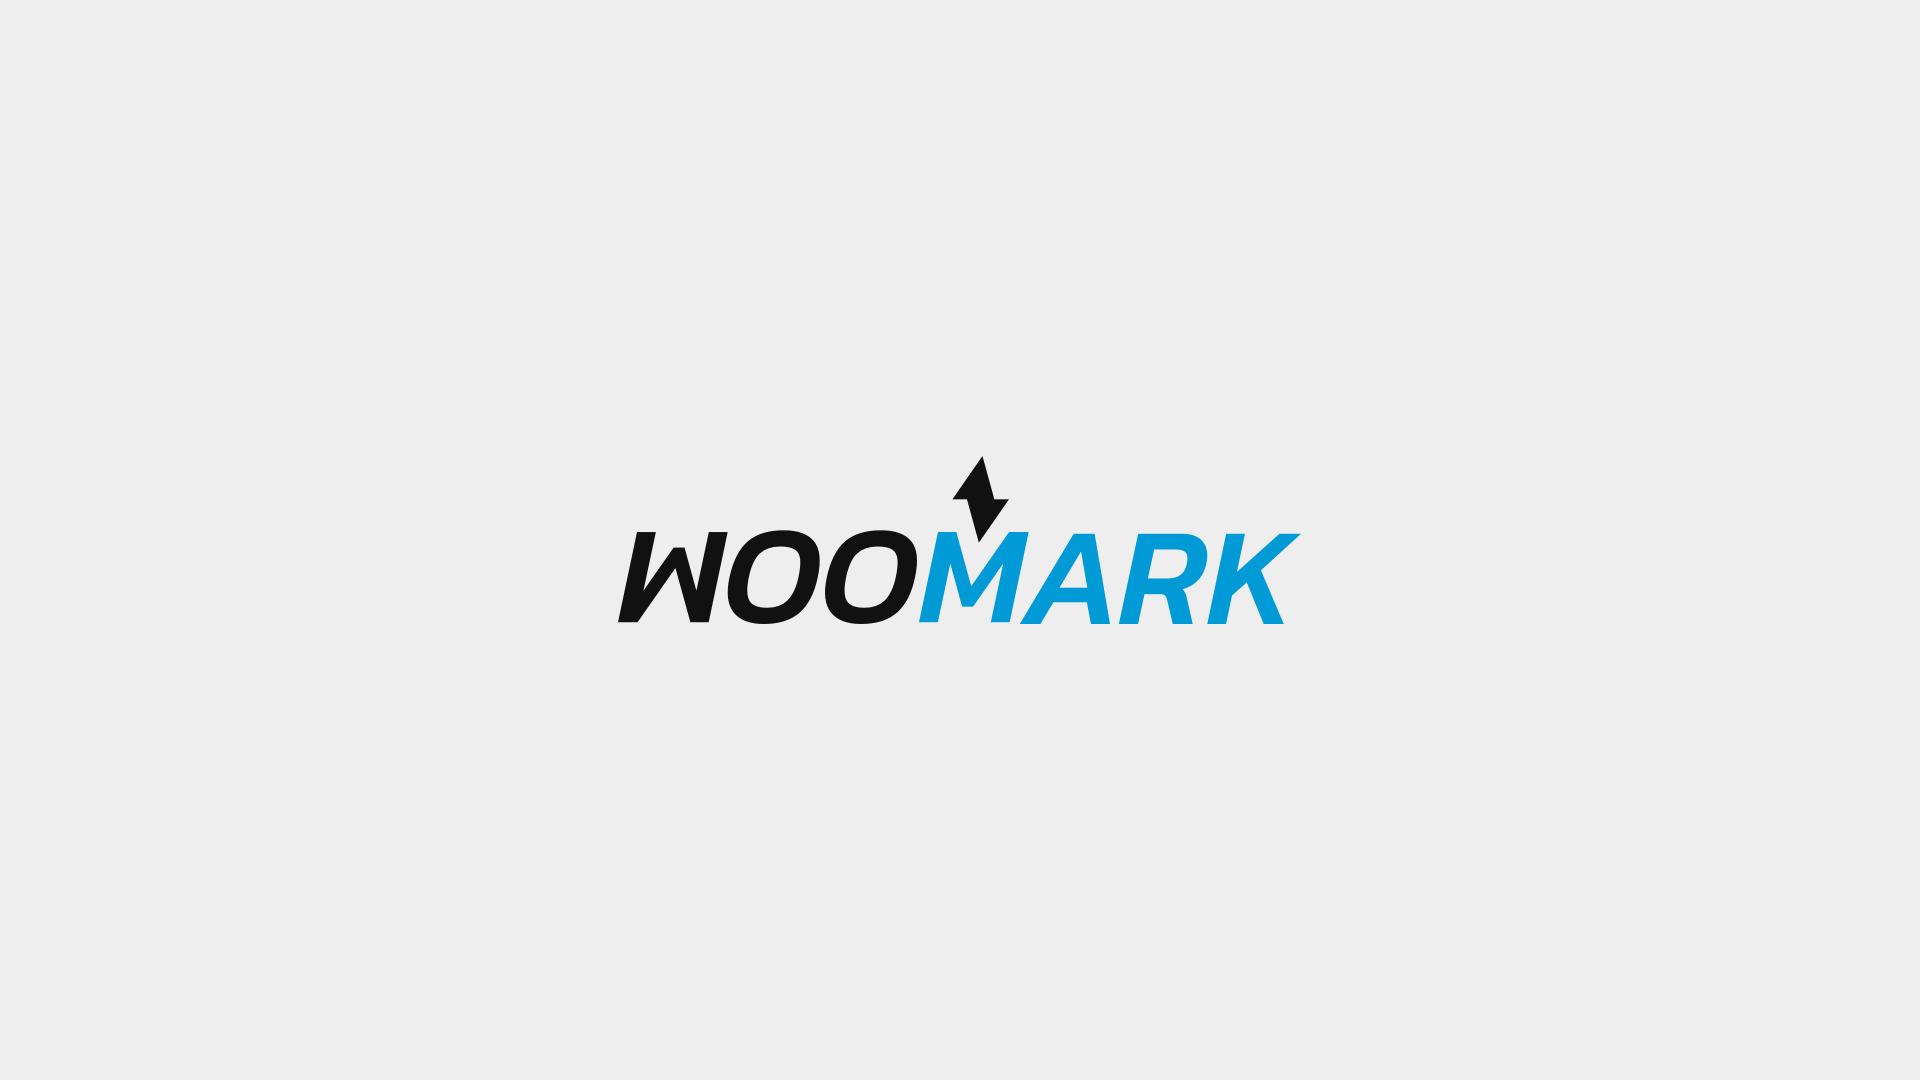 WOOMARK_10